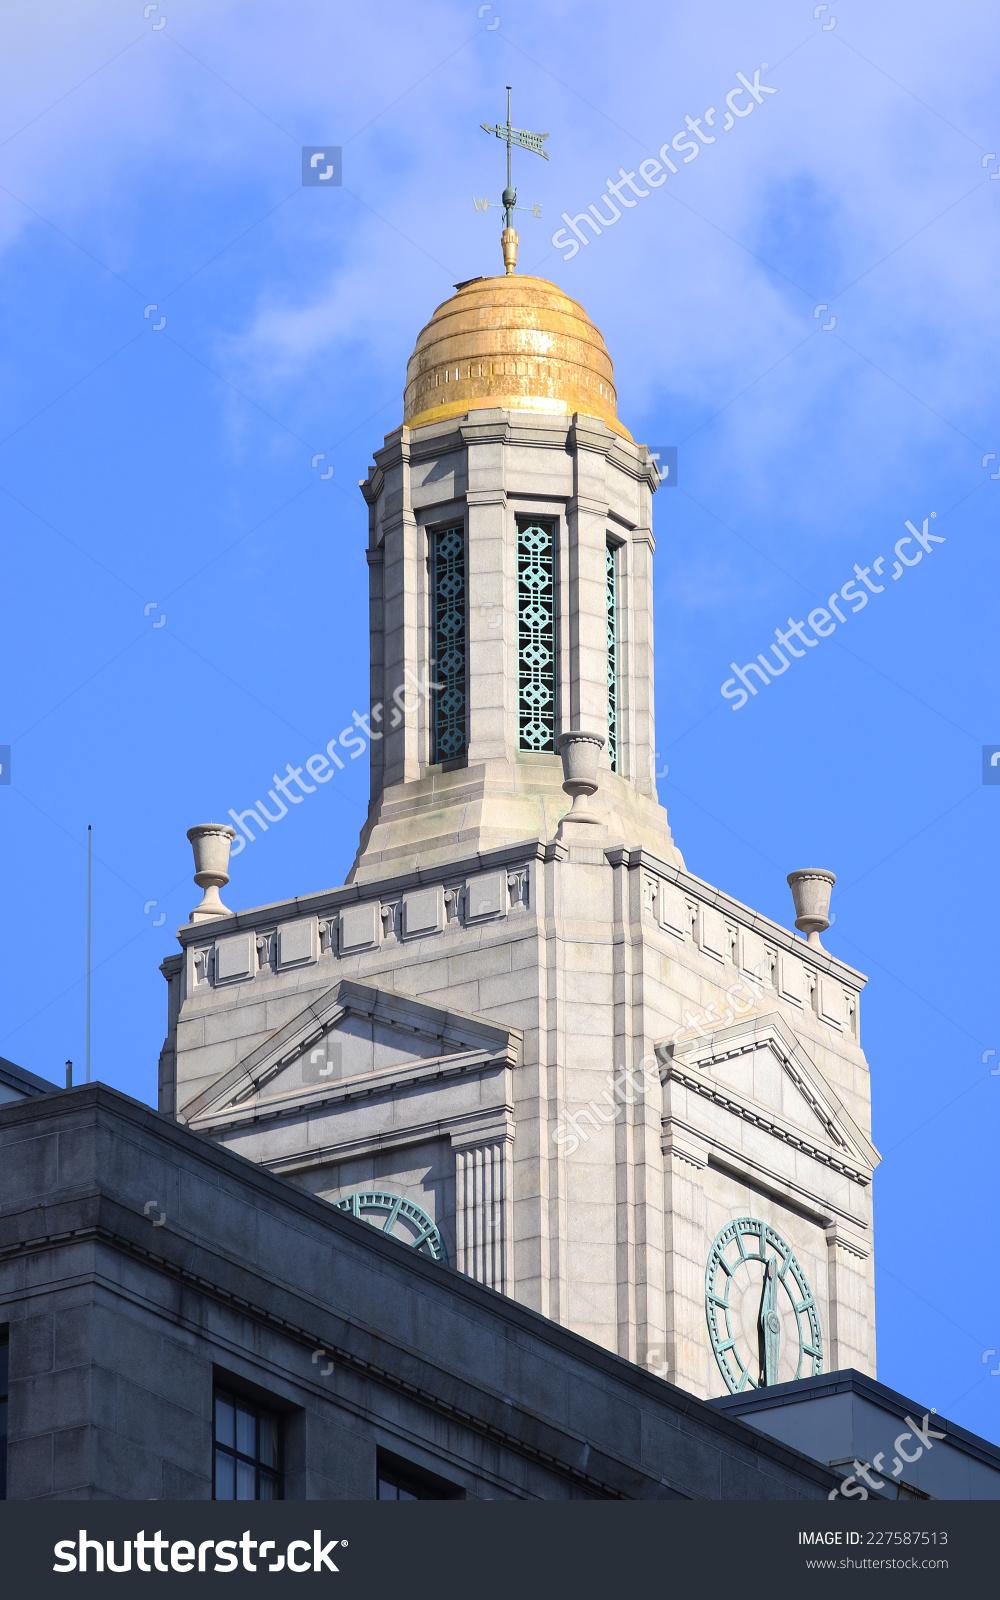 Newbry Called Boston New England Mutual Stock Photo 227587513.